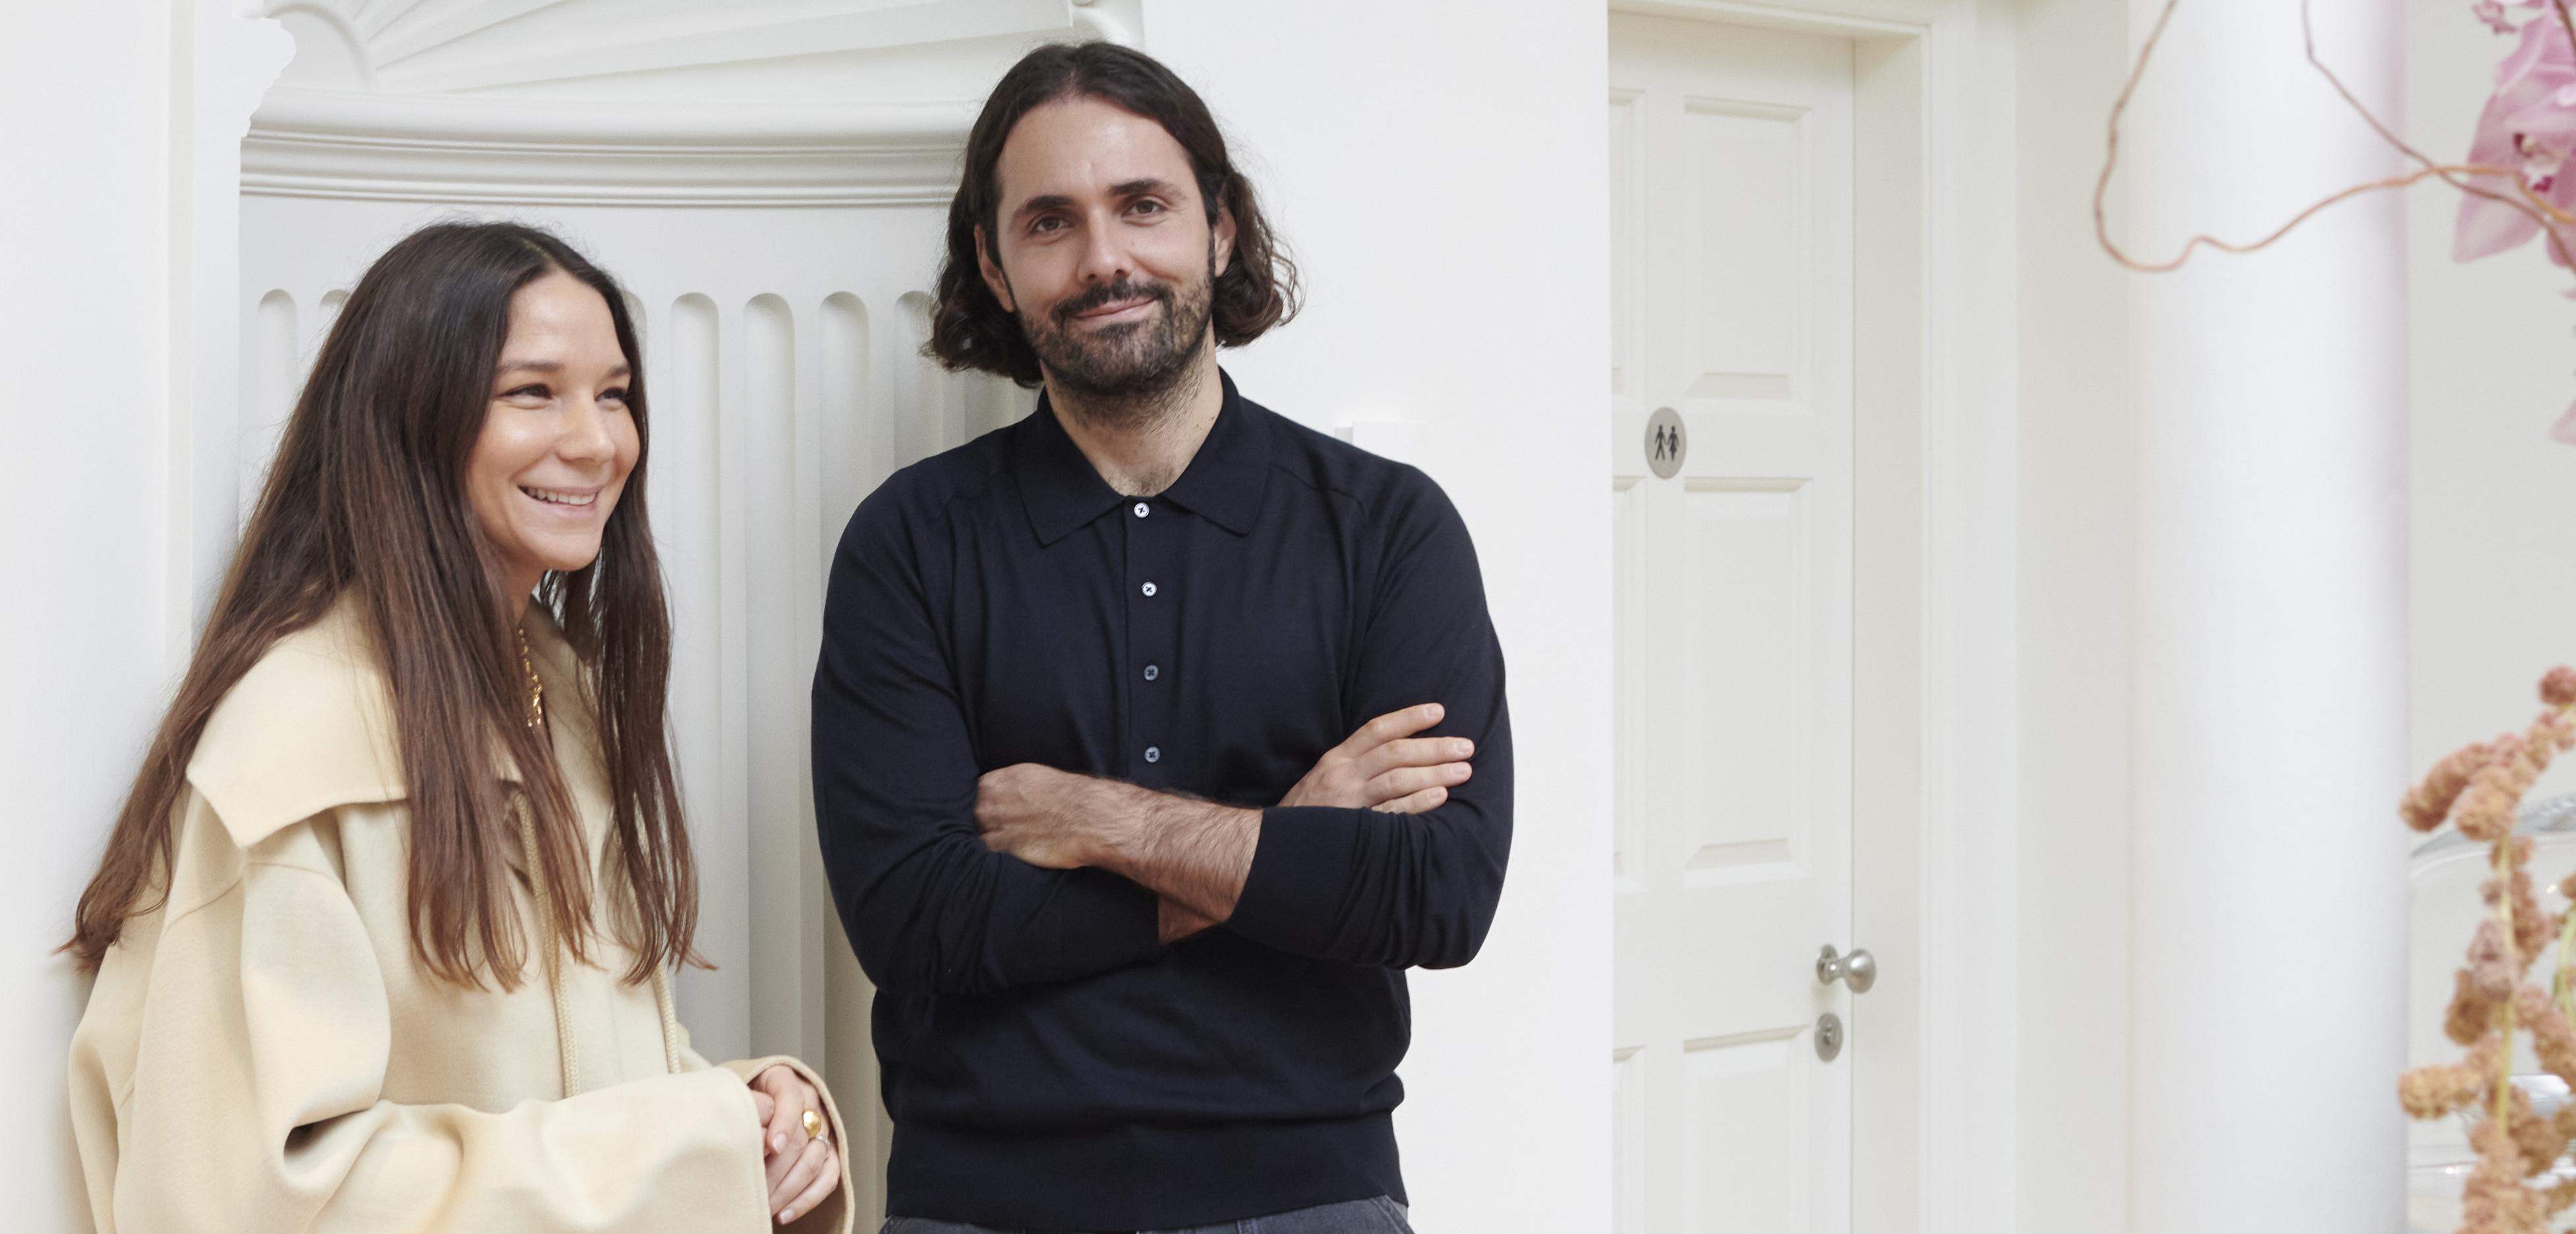 Sandra Sandor and Peter Baldaszti, life and business partners behind the luxury womenswear brand Nanushka.